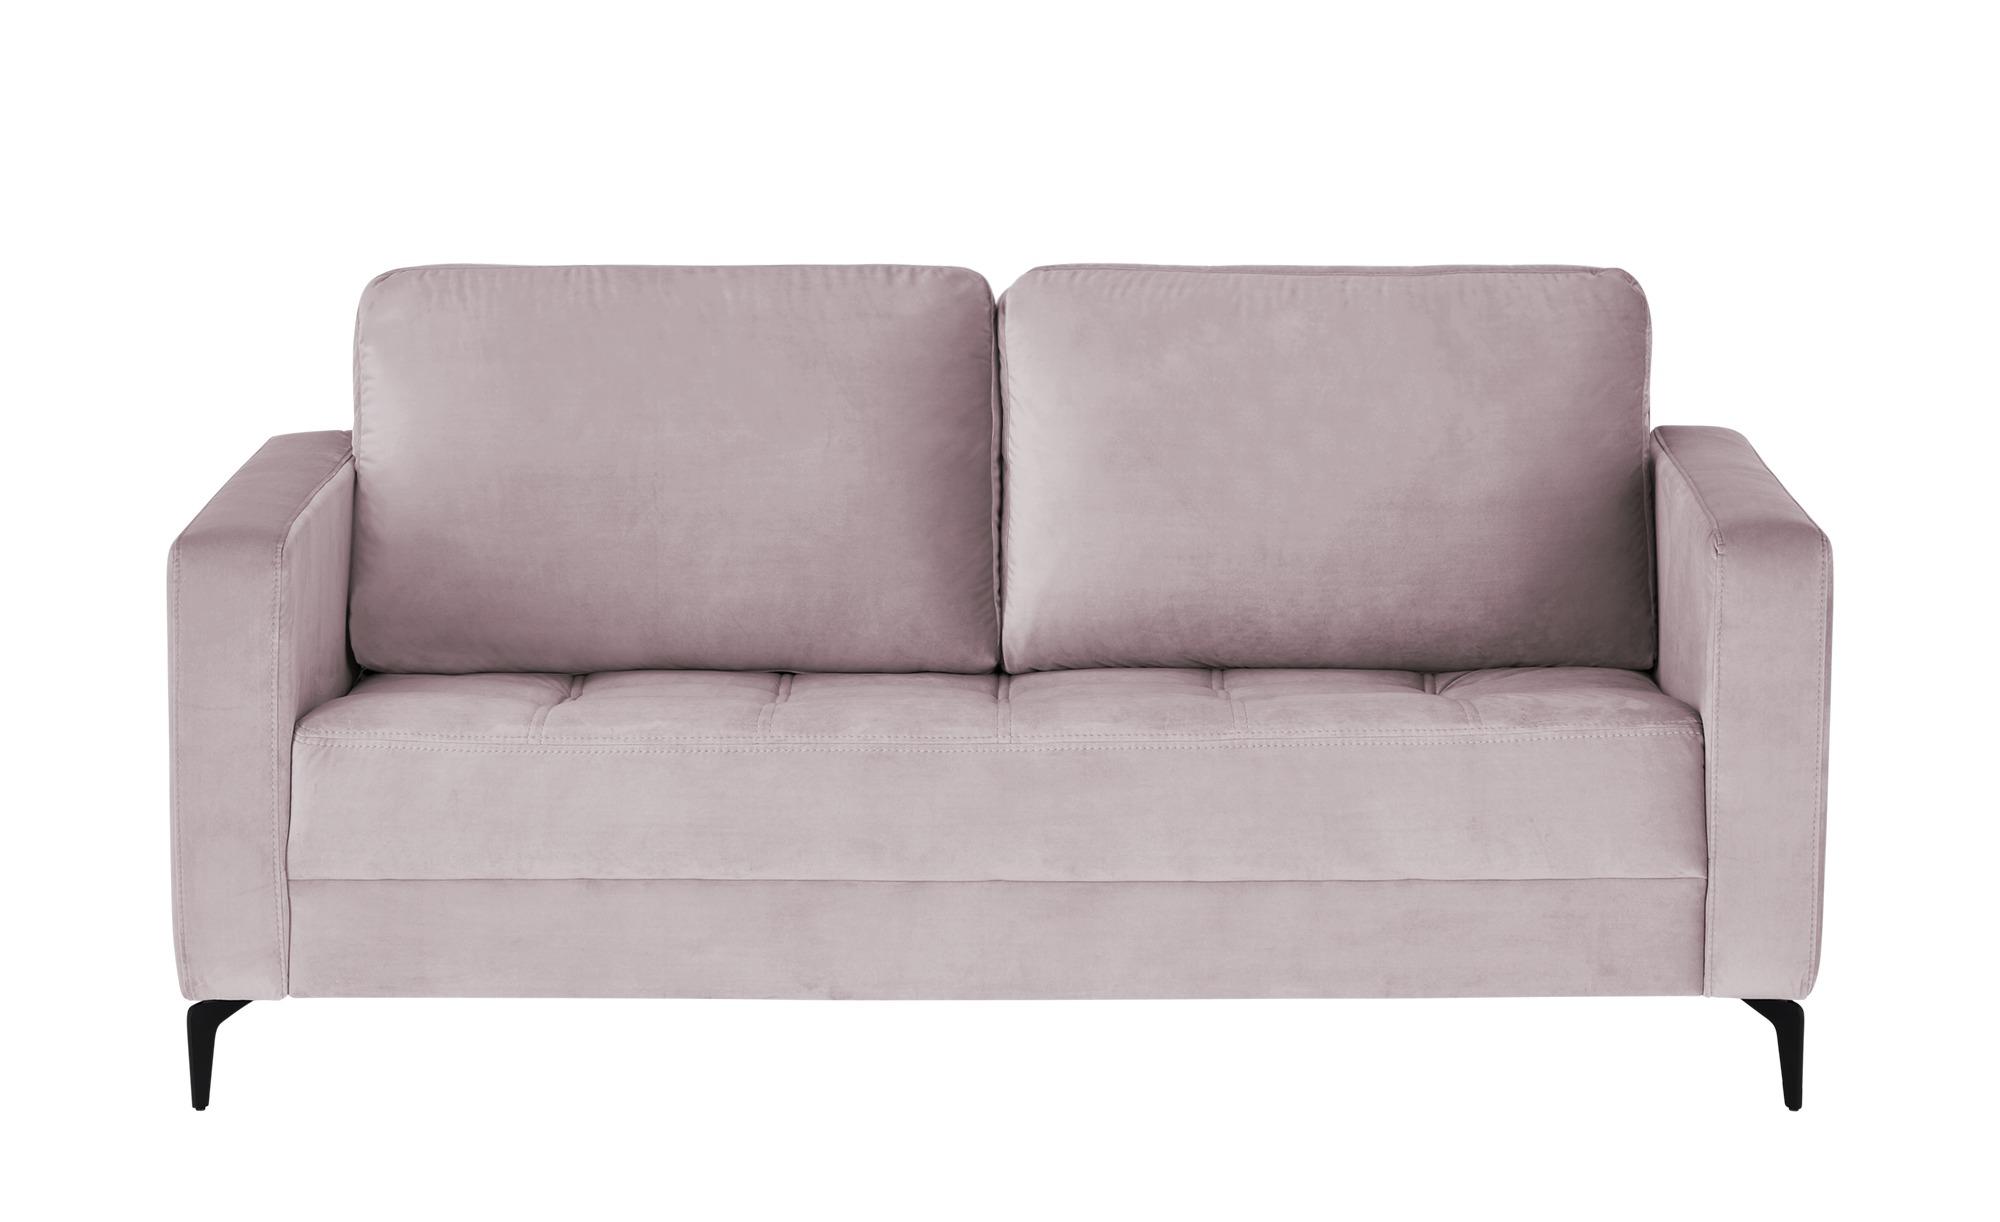 smart Sofa  Gesa ¦ rosa/pink ¦ Maße (cm): B: 178 H: 83 T: 91 Polstermöbel > Sofas > 2-Sitzer - Höffner